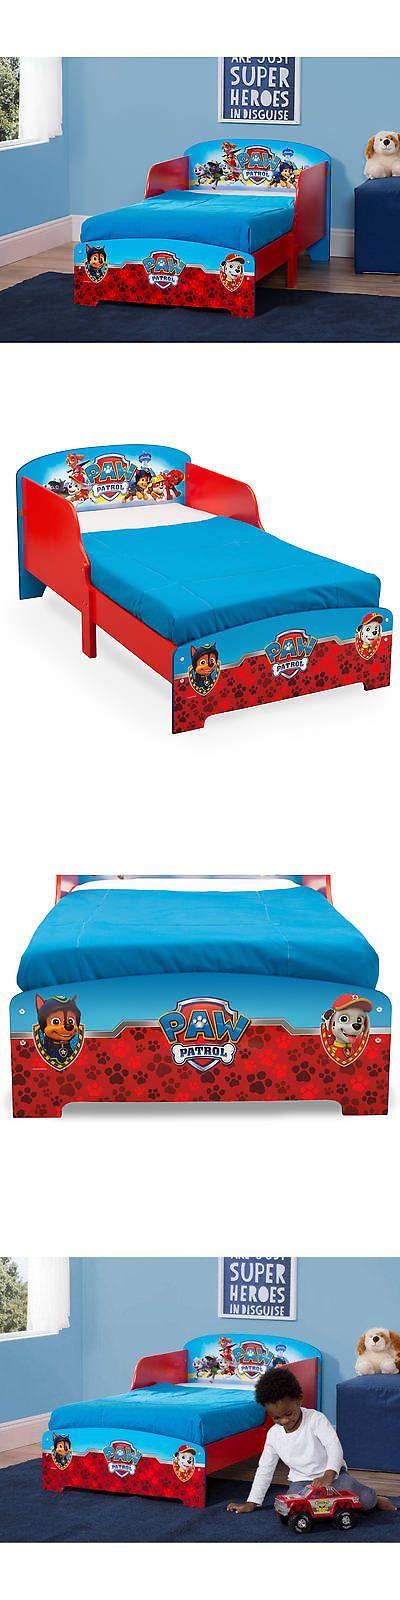 Kids Furniture: Paw Patrol Toddler Bed W Attached Guardrails Wood Frame Kids Furniture Nick Jr. -> BUY IT NOW ONLY: $93.09 on eBay!